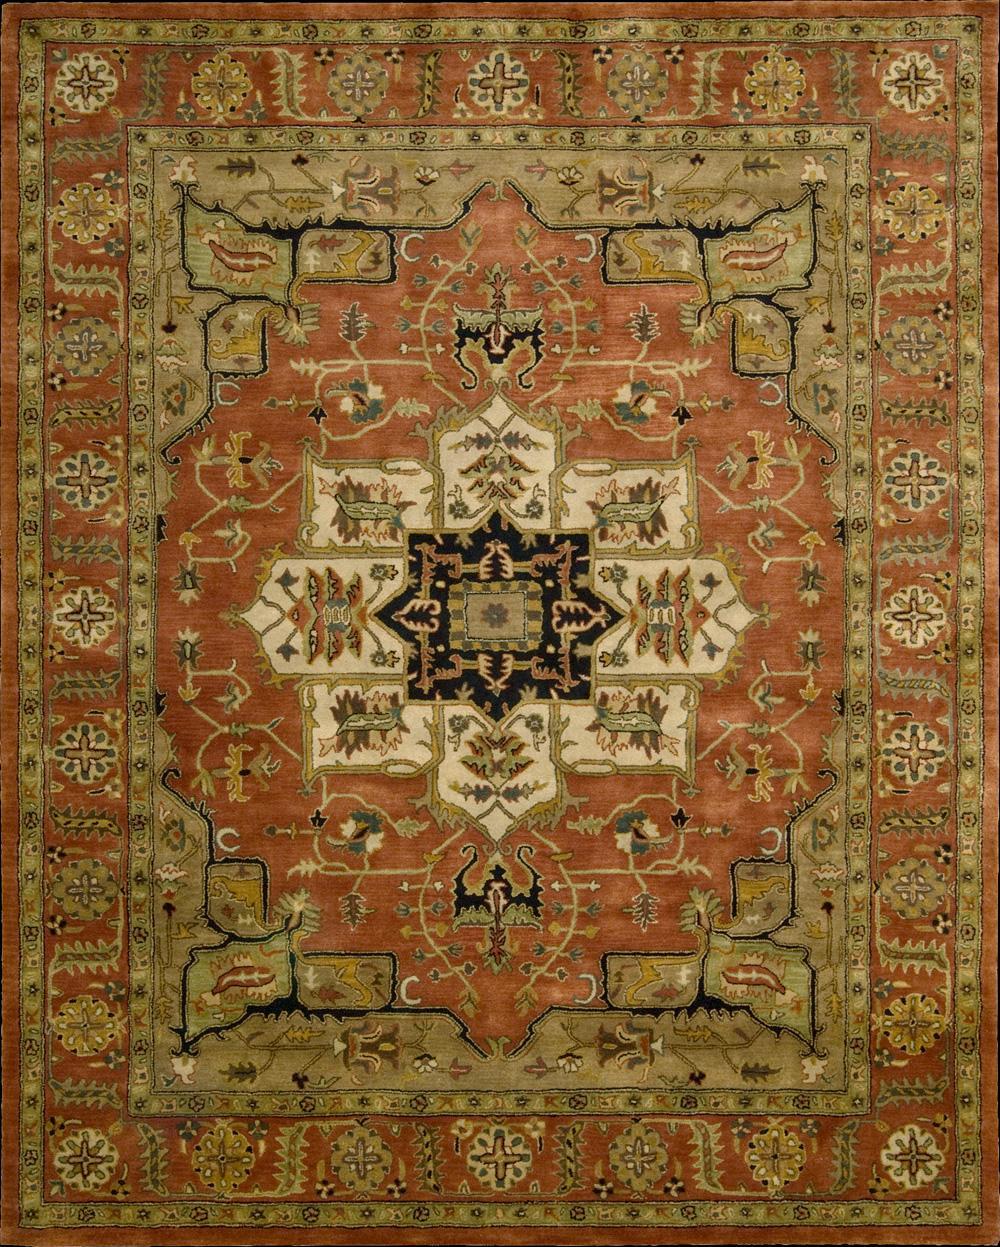 "Nourison Jaipur Area Rug 9'6"" x 13'6"" - Item Number: 34293"